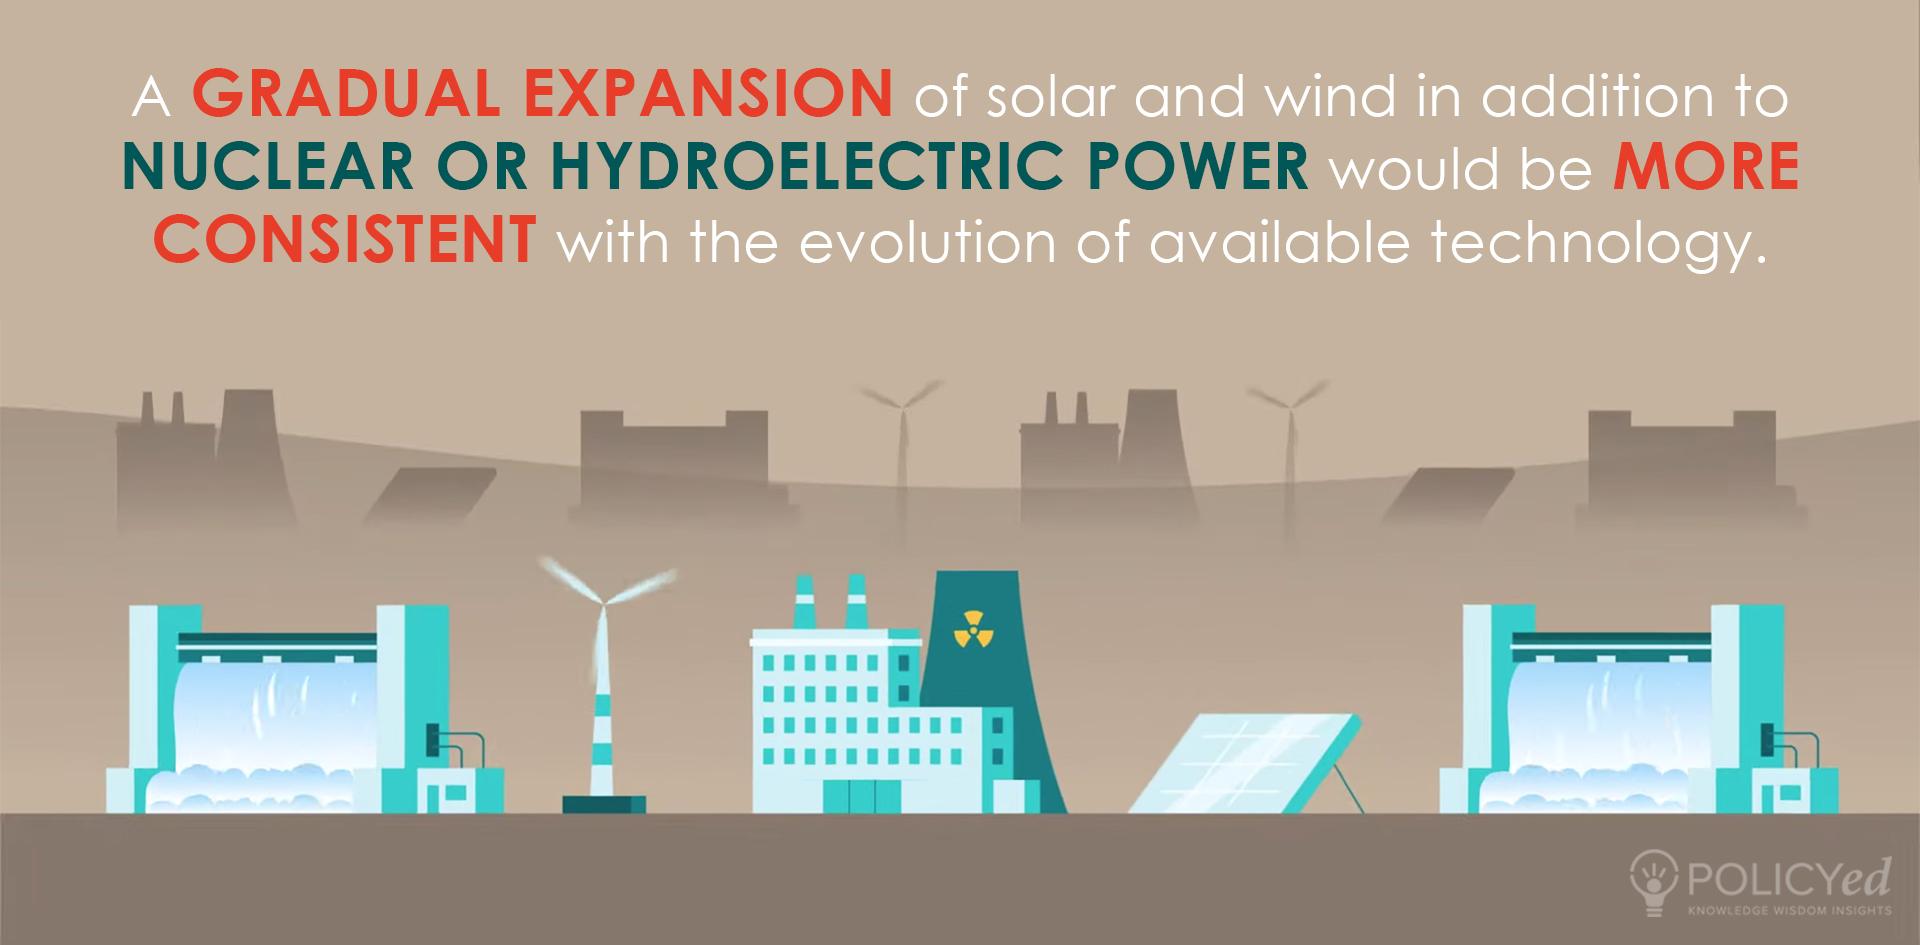 Expanding Low-Carbon Energy Production